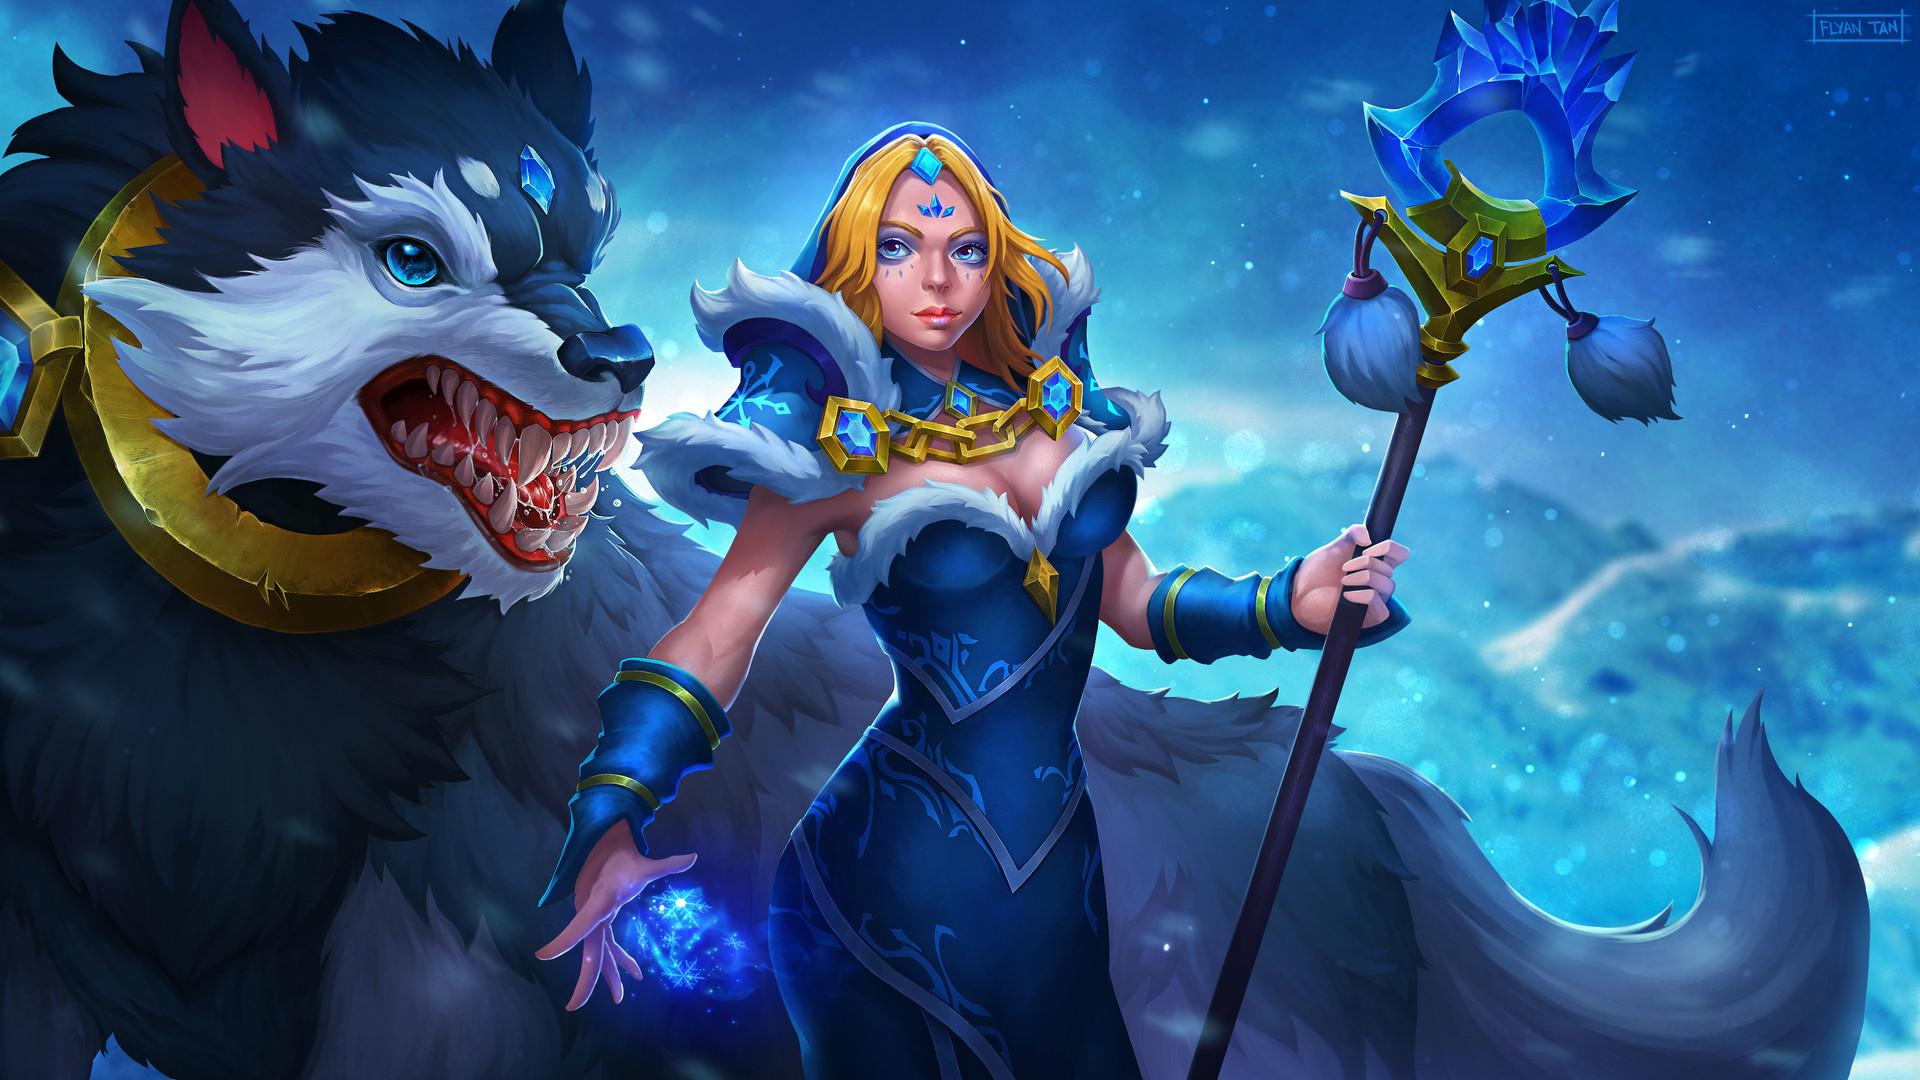 ArtStation - Dota 2 - Crystal Maiden Frost Avalanche, Flyan Tan